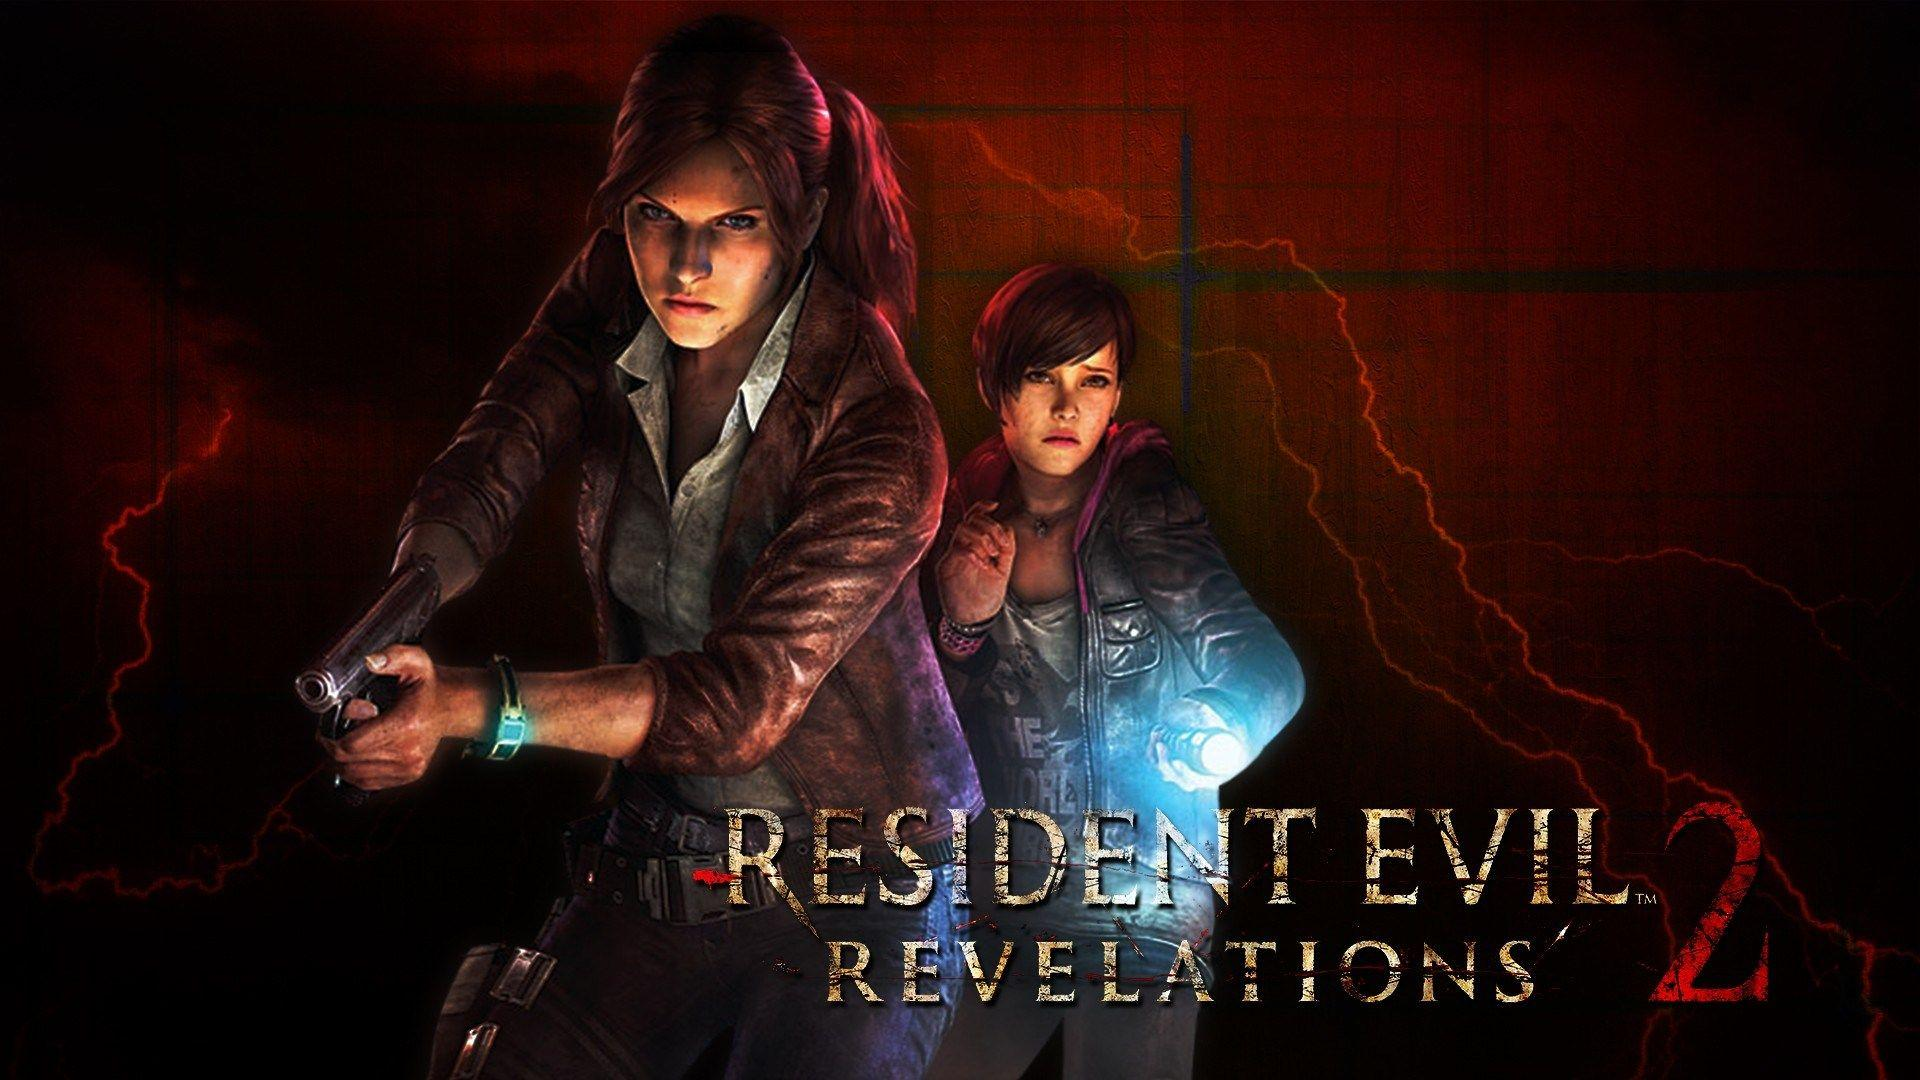 Resident Evil: Revelations 2 Wallpapers - Top Free Resident Evil: Revelations  2 Backgrounds - WallpaperAccess